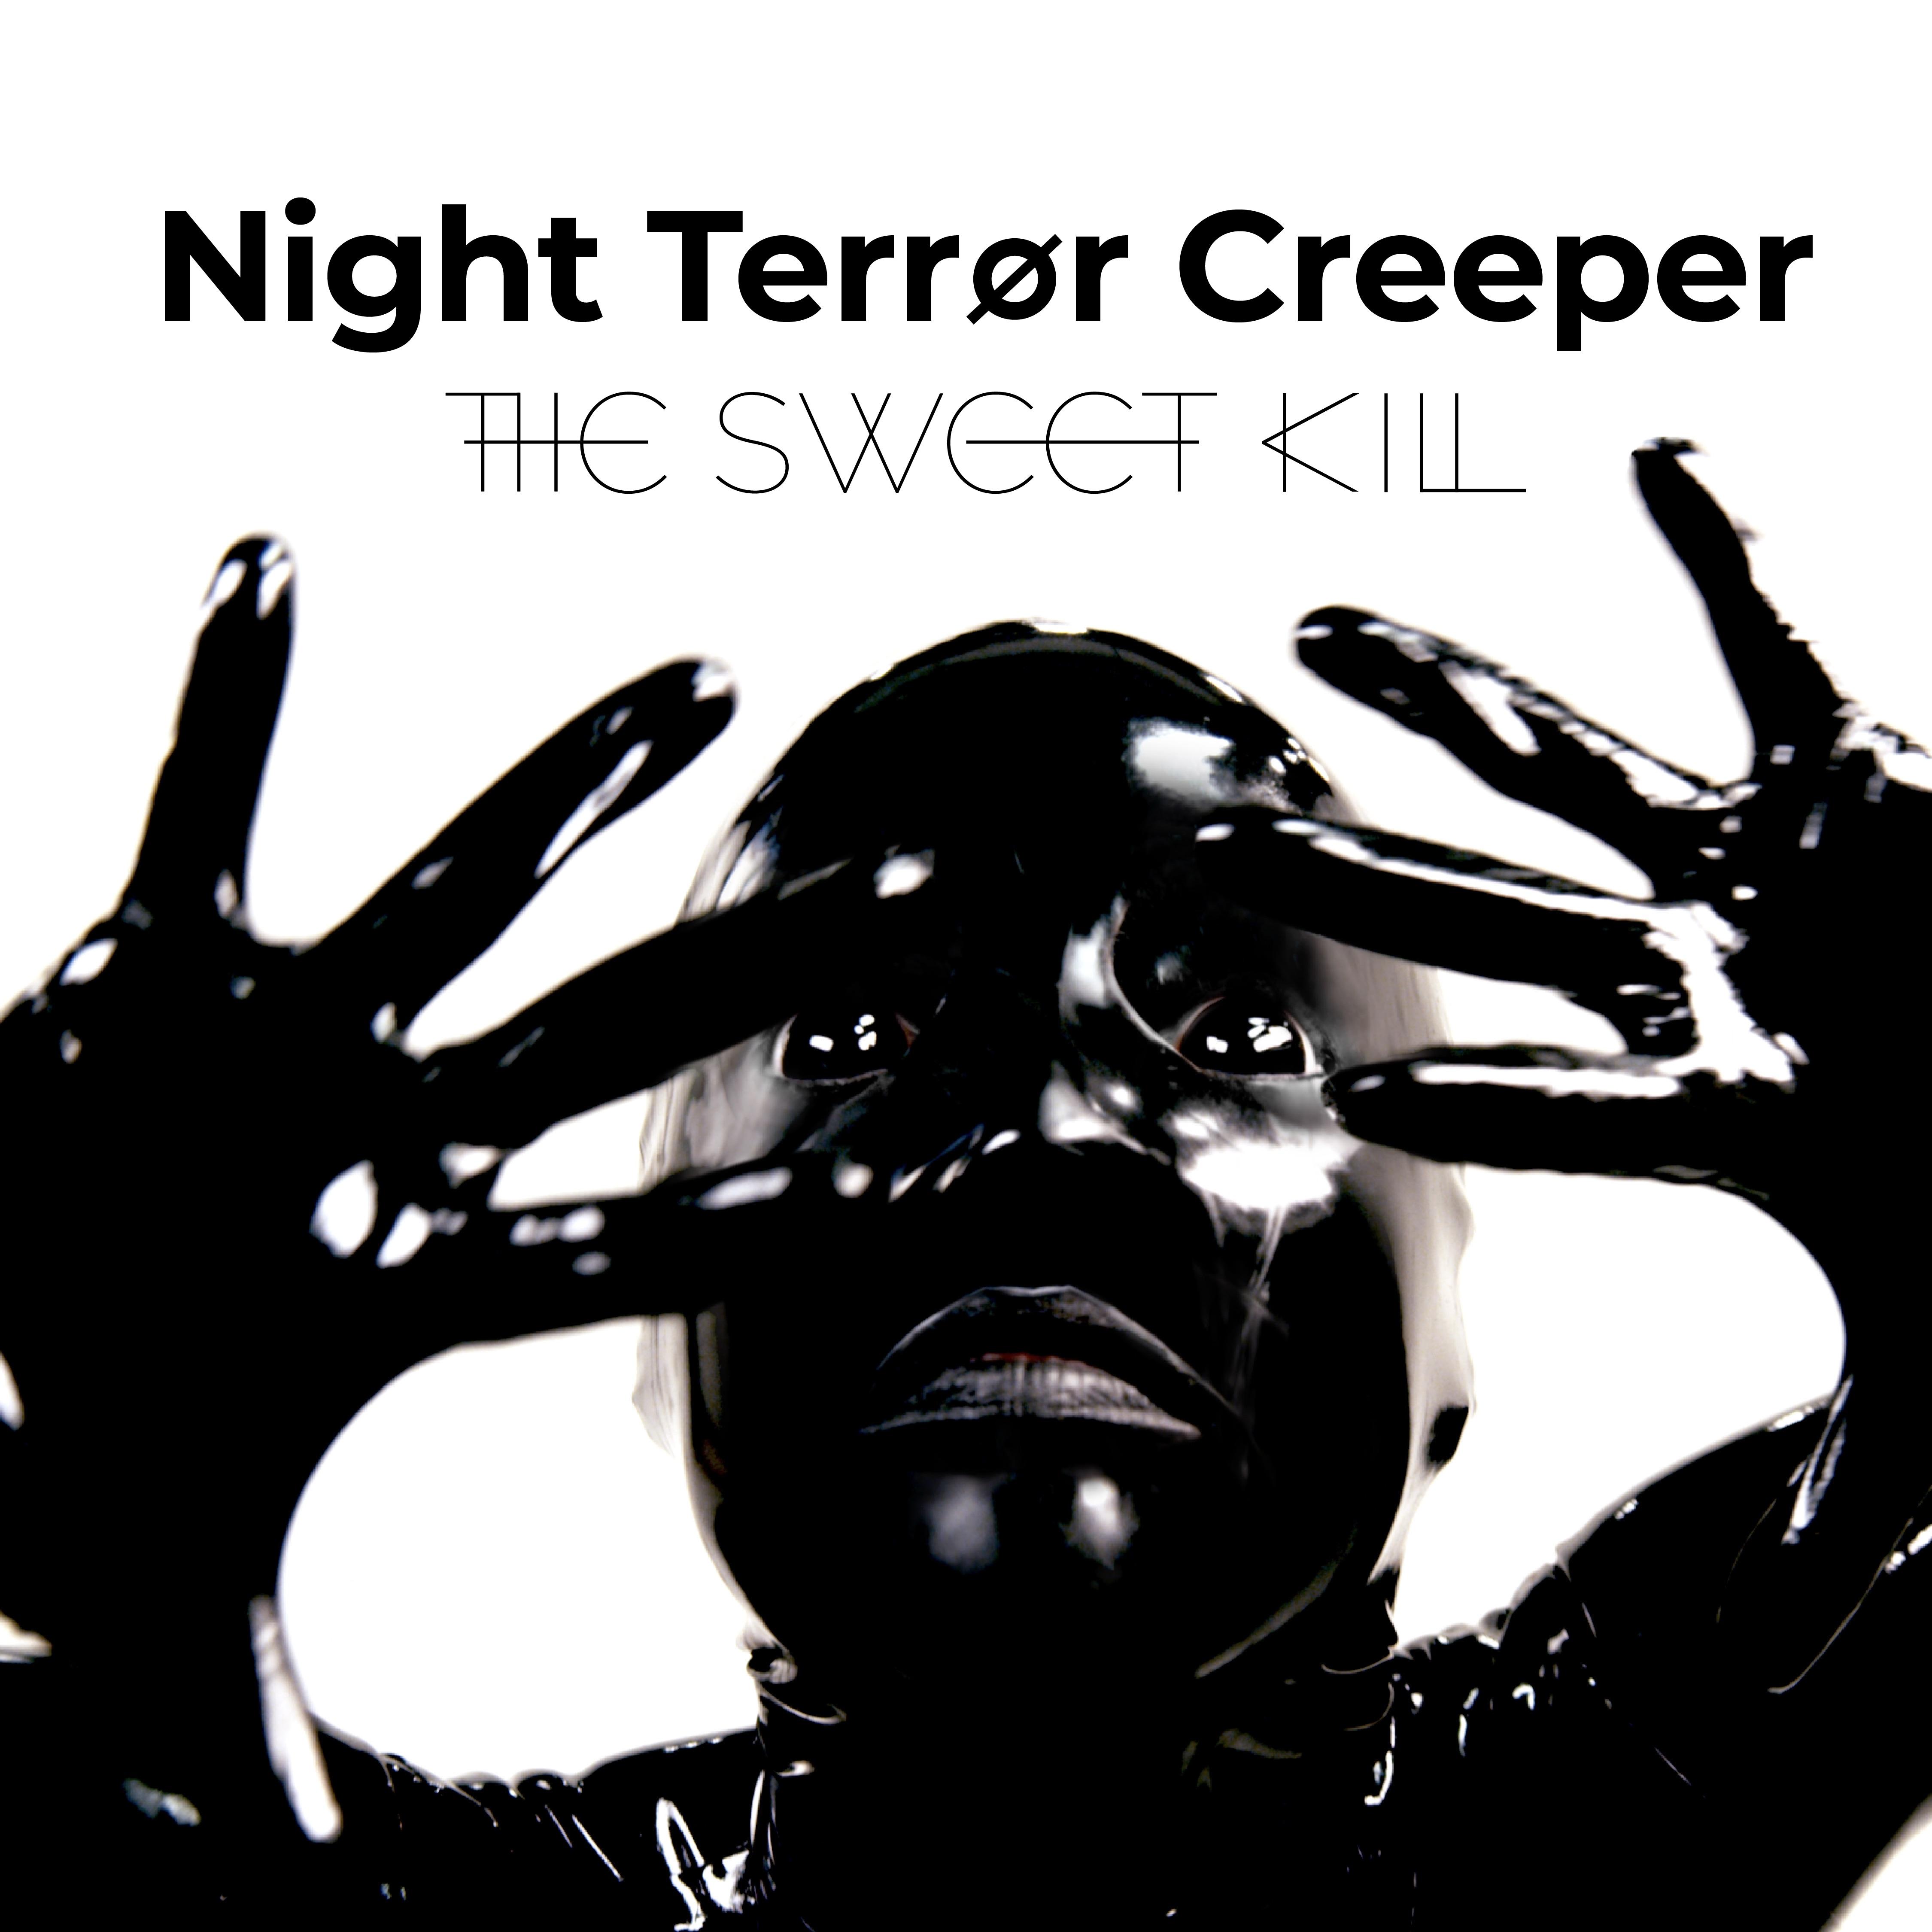 Night Terror Creeper